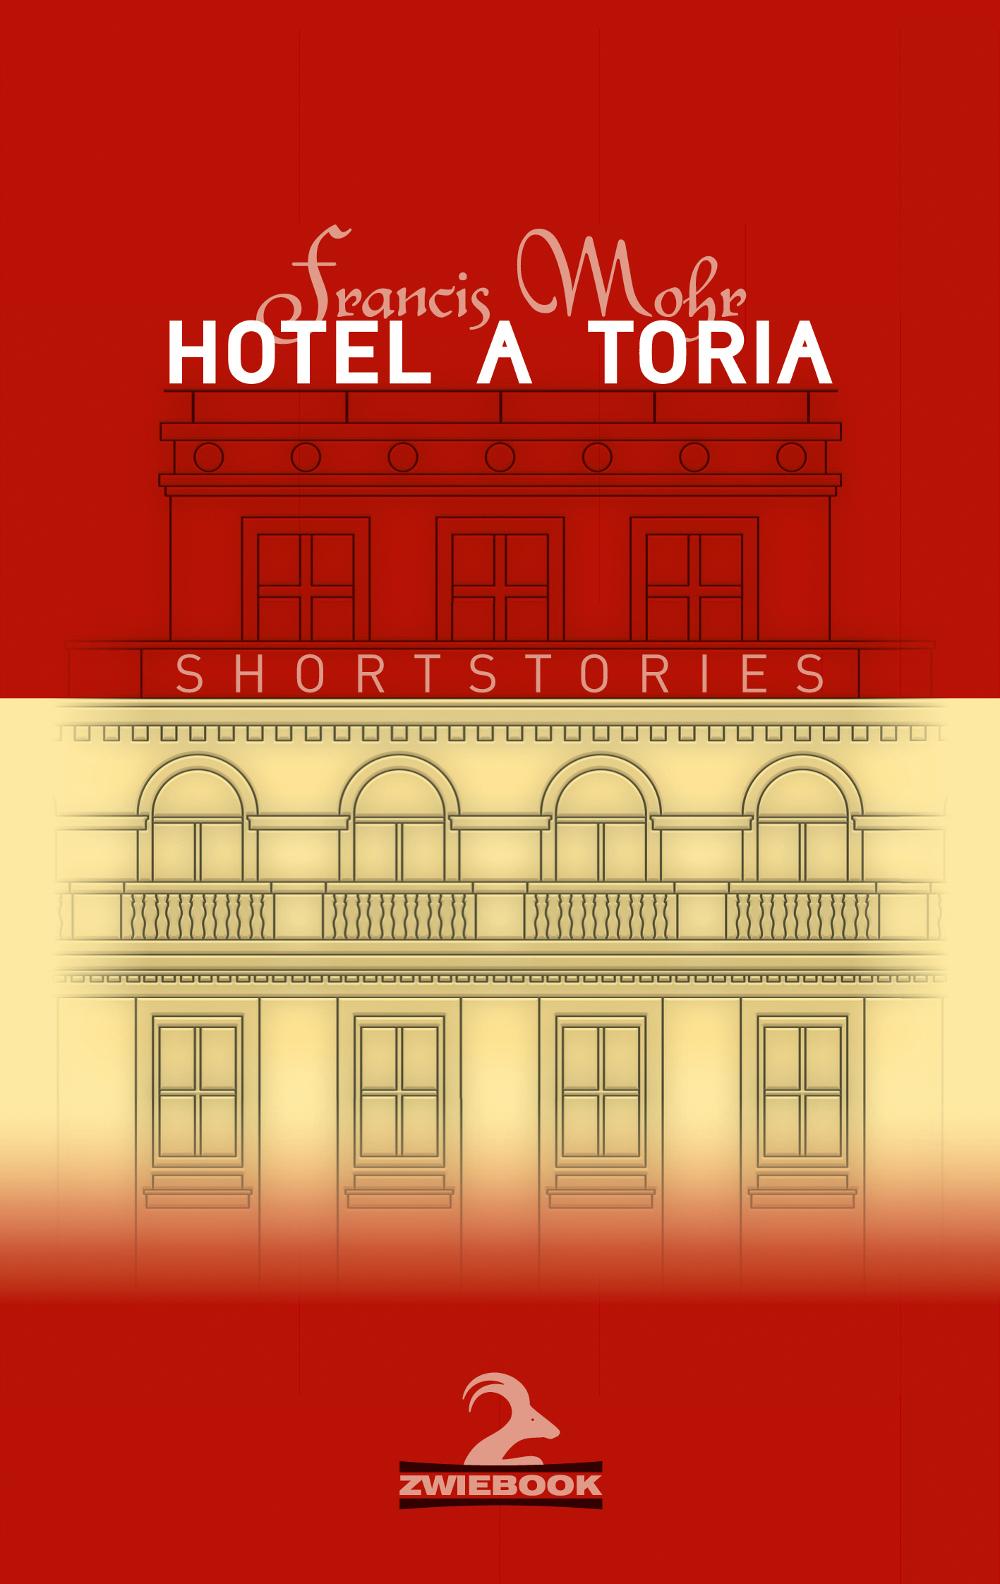 Mohr Francis Hotel A Toria